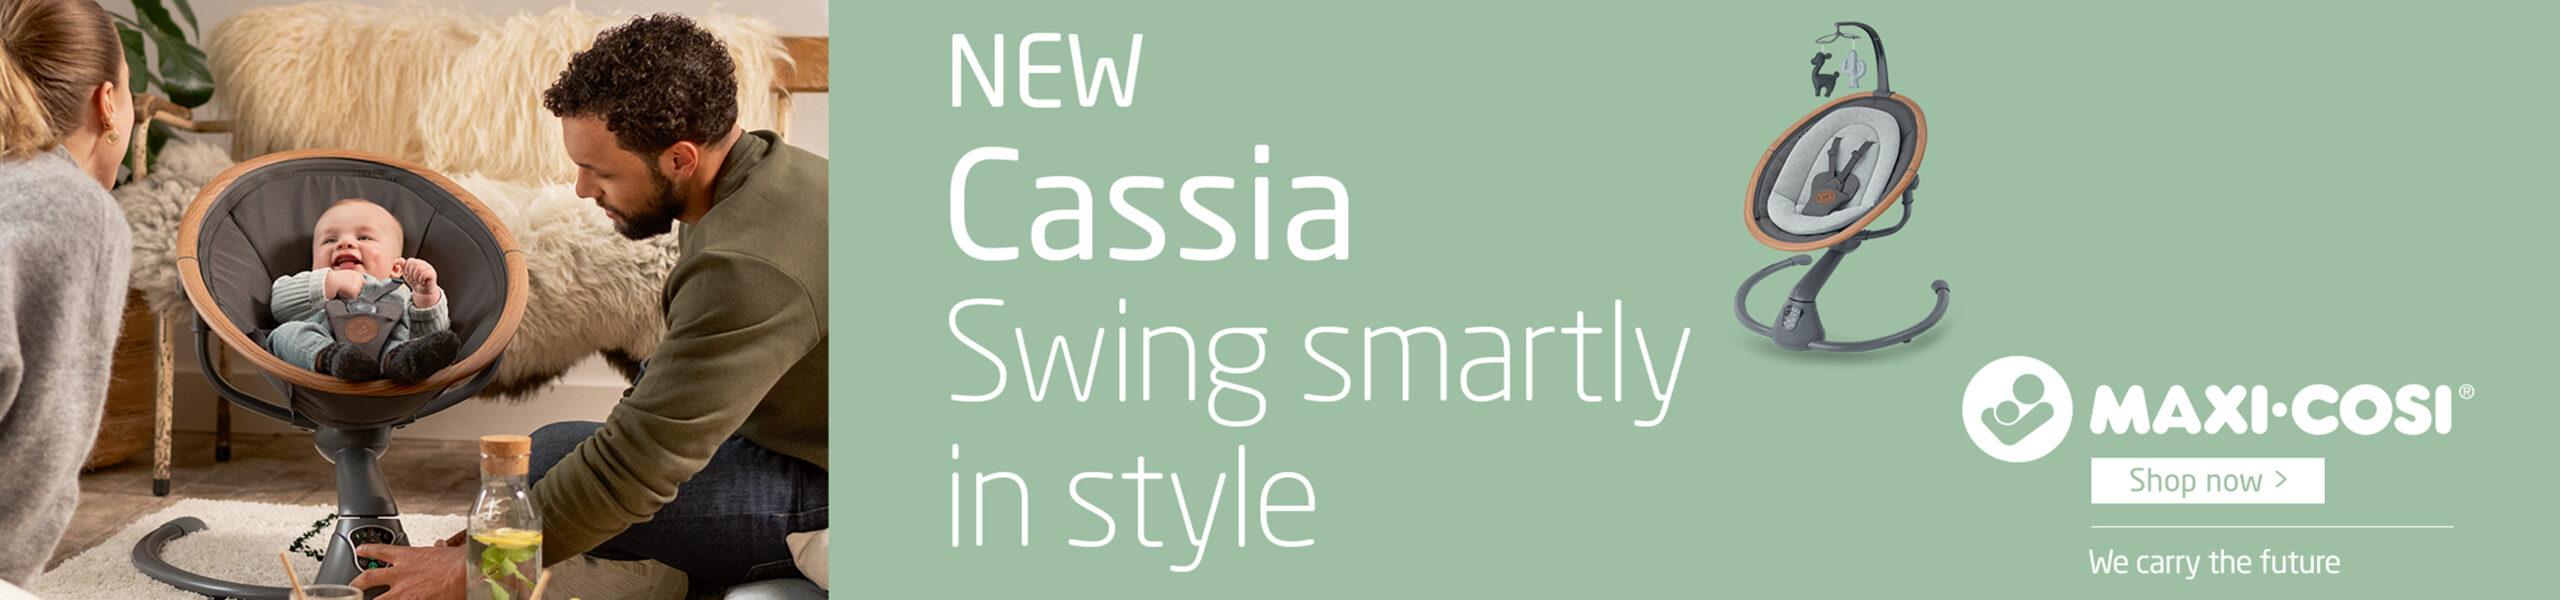 Maxi-Cosi Cassia